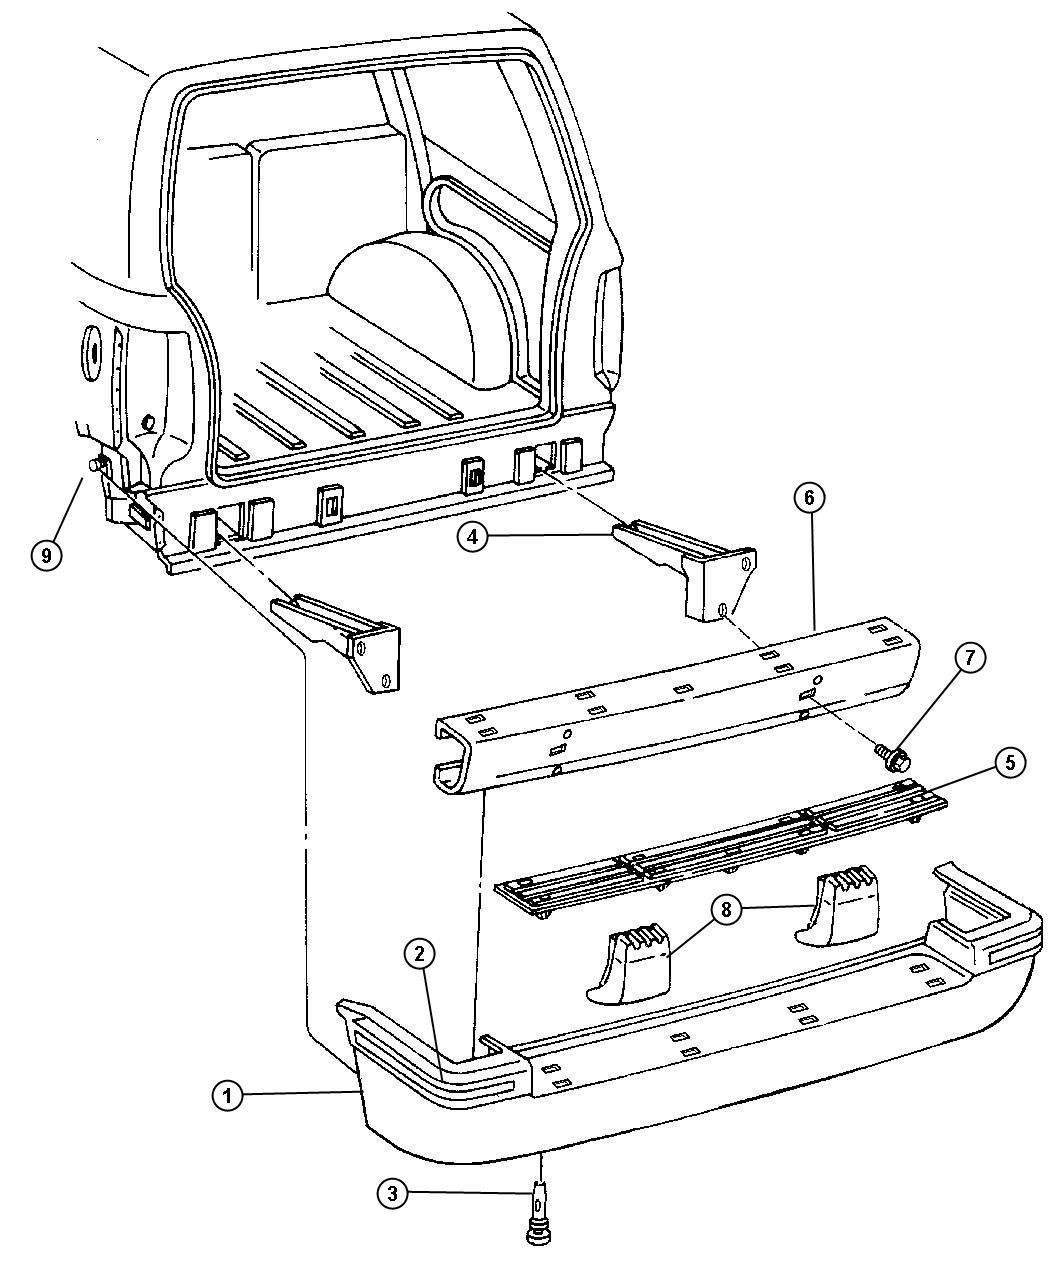 Diagram Wiring Diagram For Jeep Grand Cherokee Full